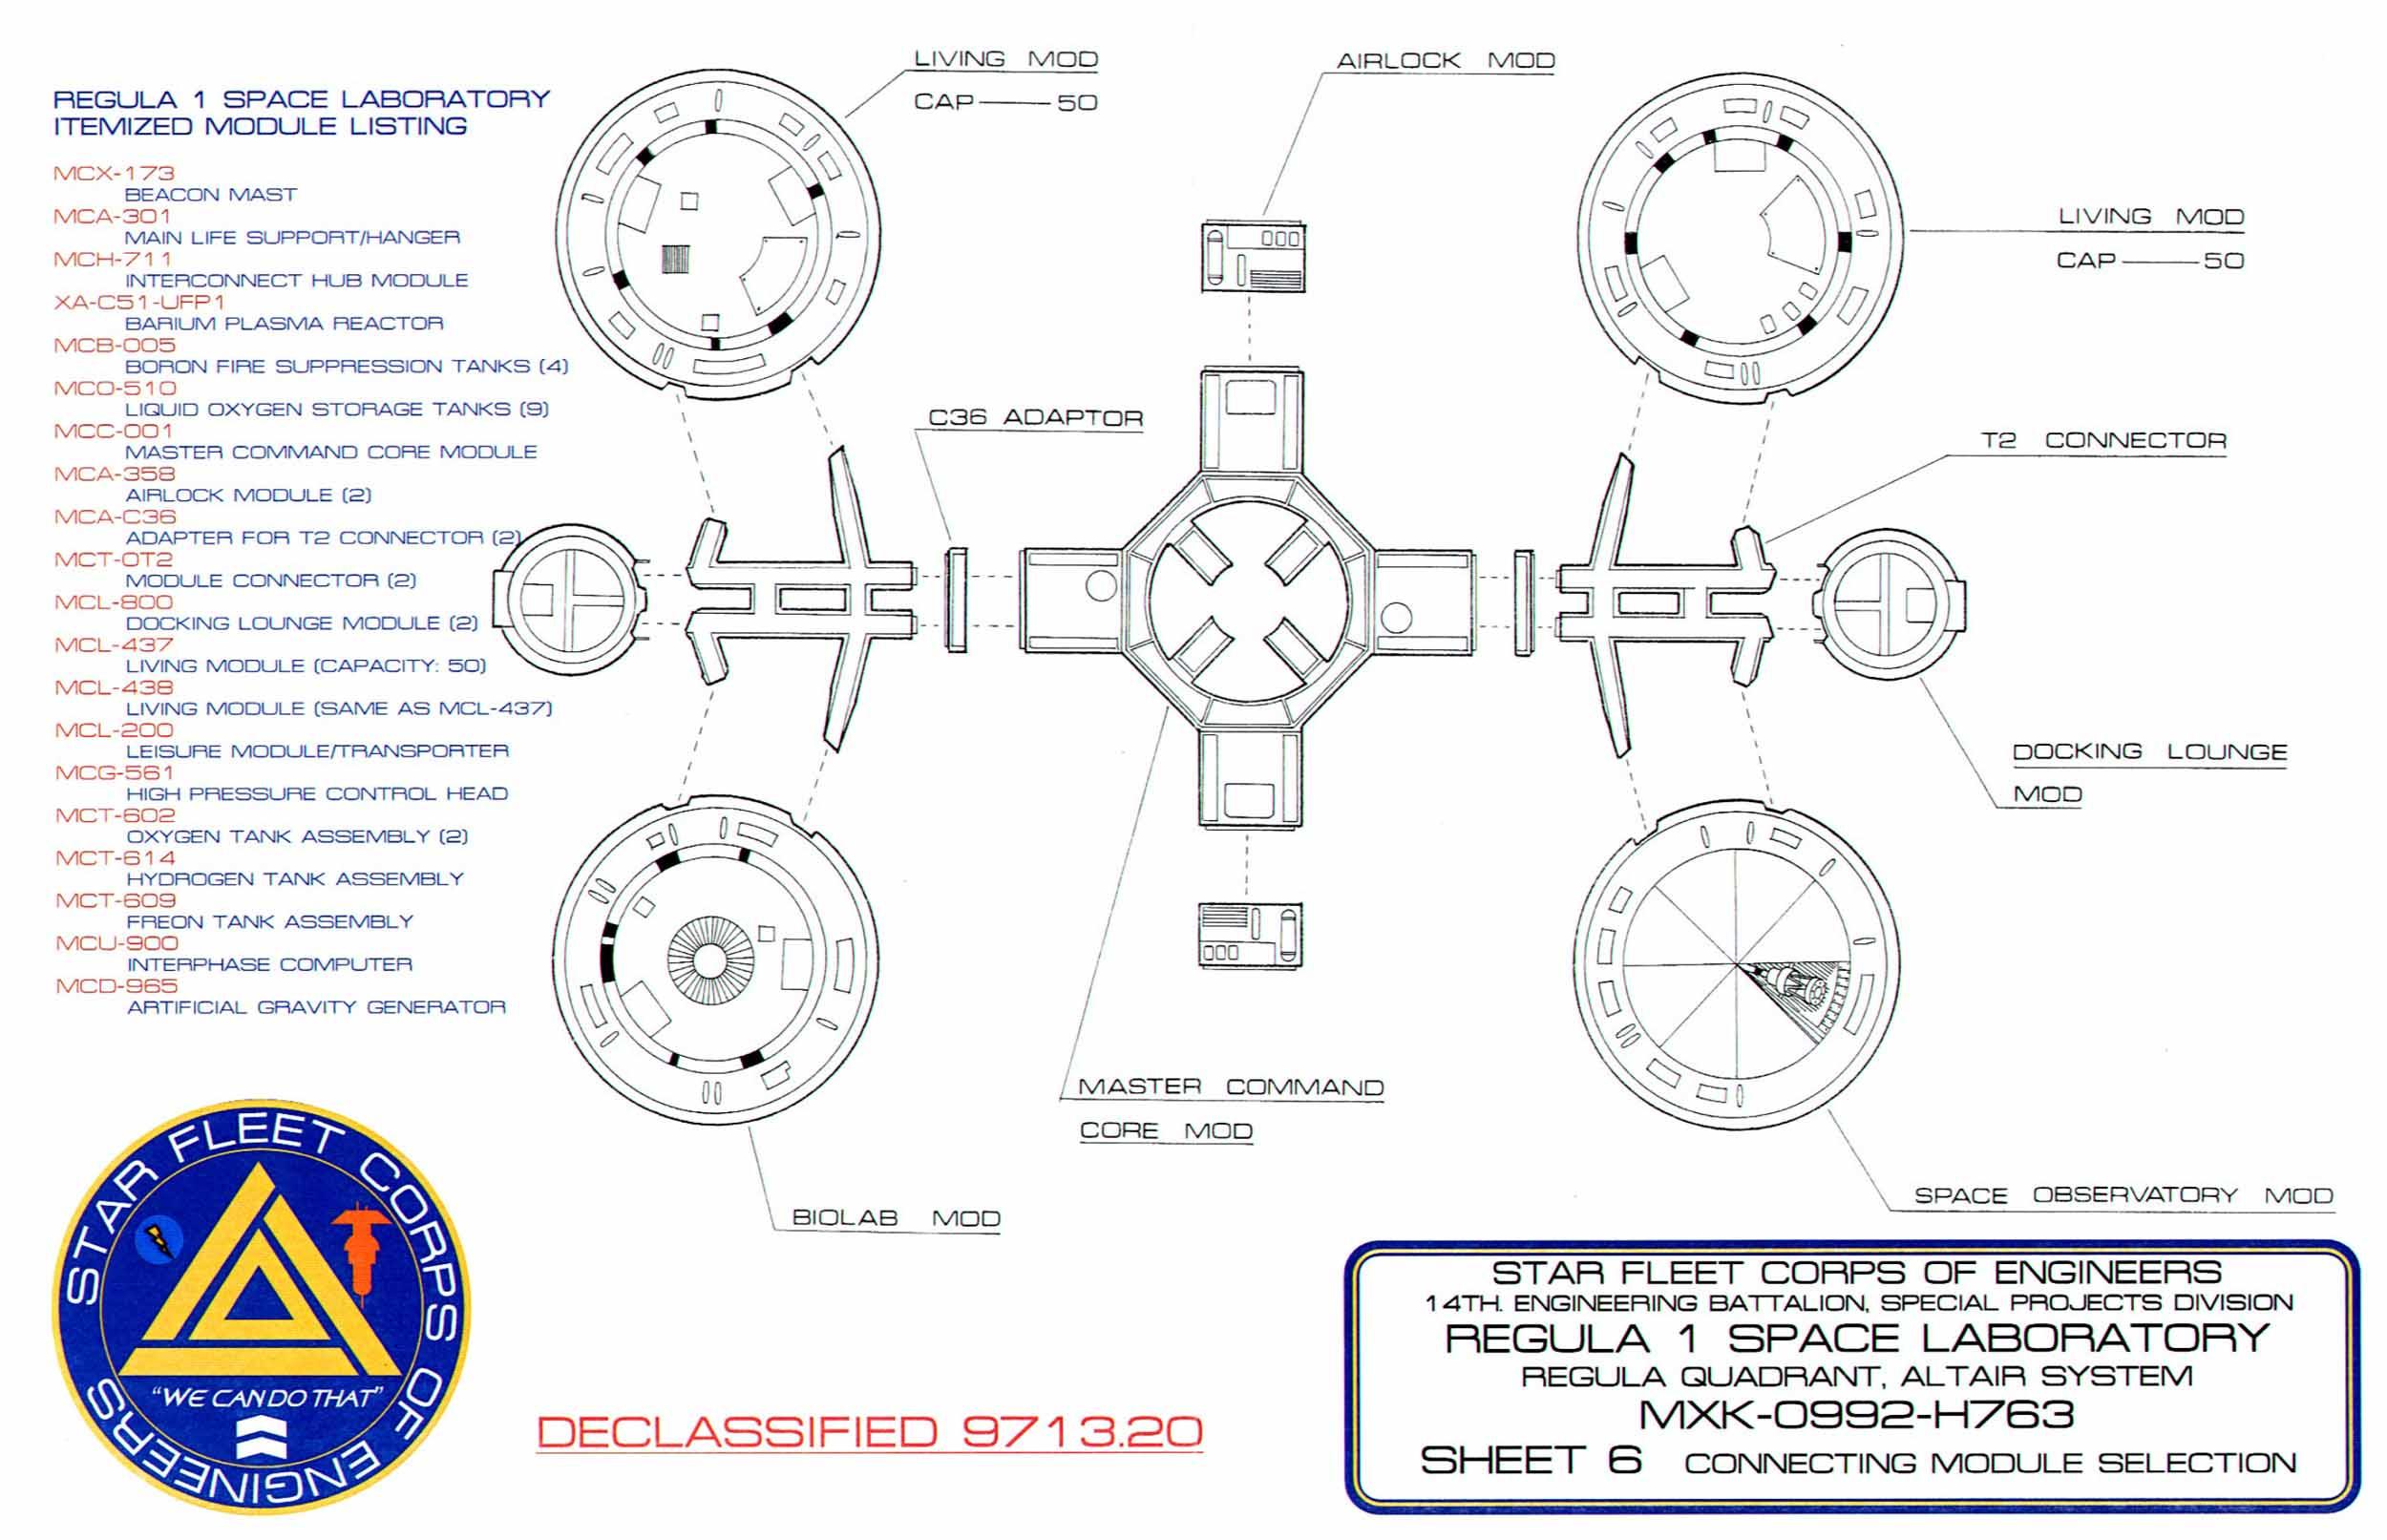 spacelaboratoryregula1sheet6.jpg